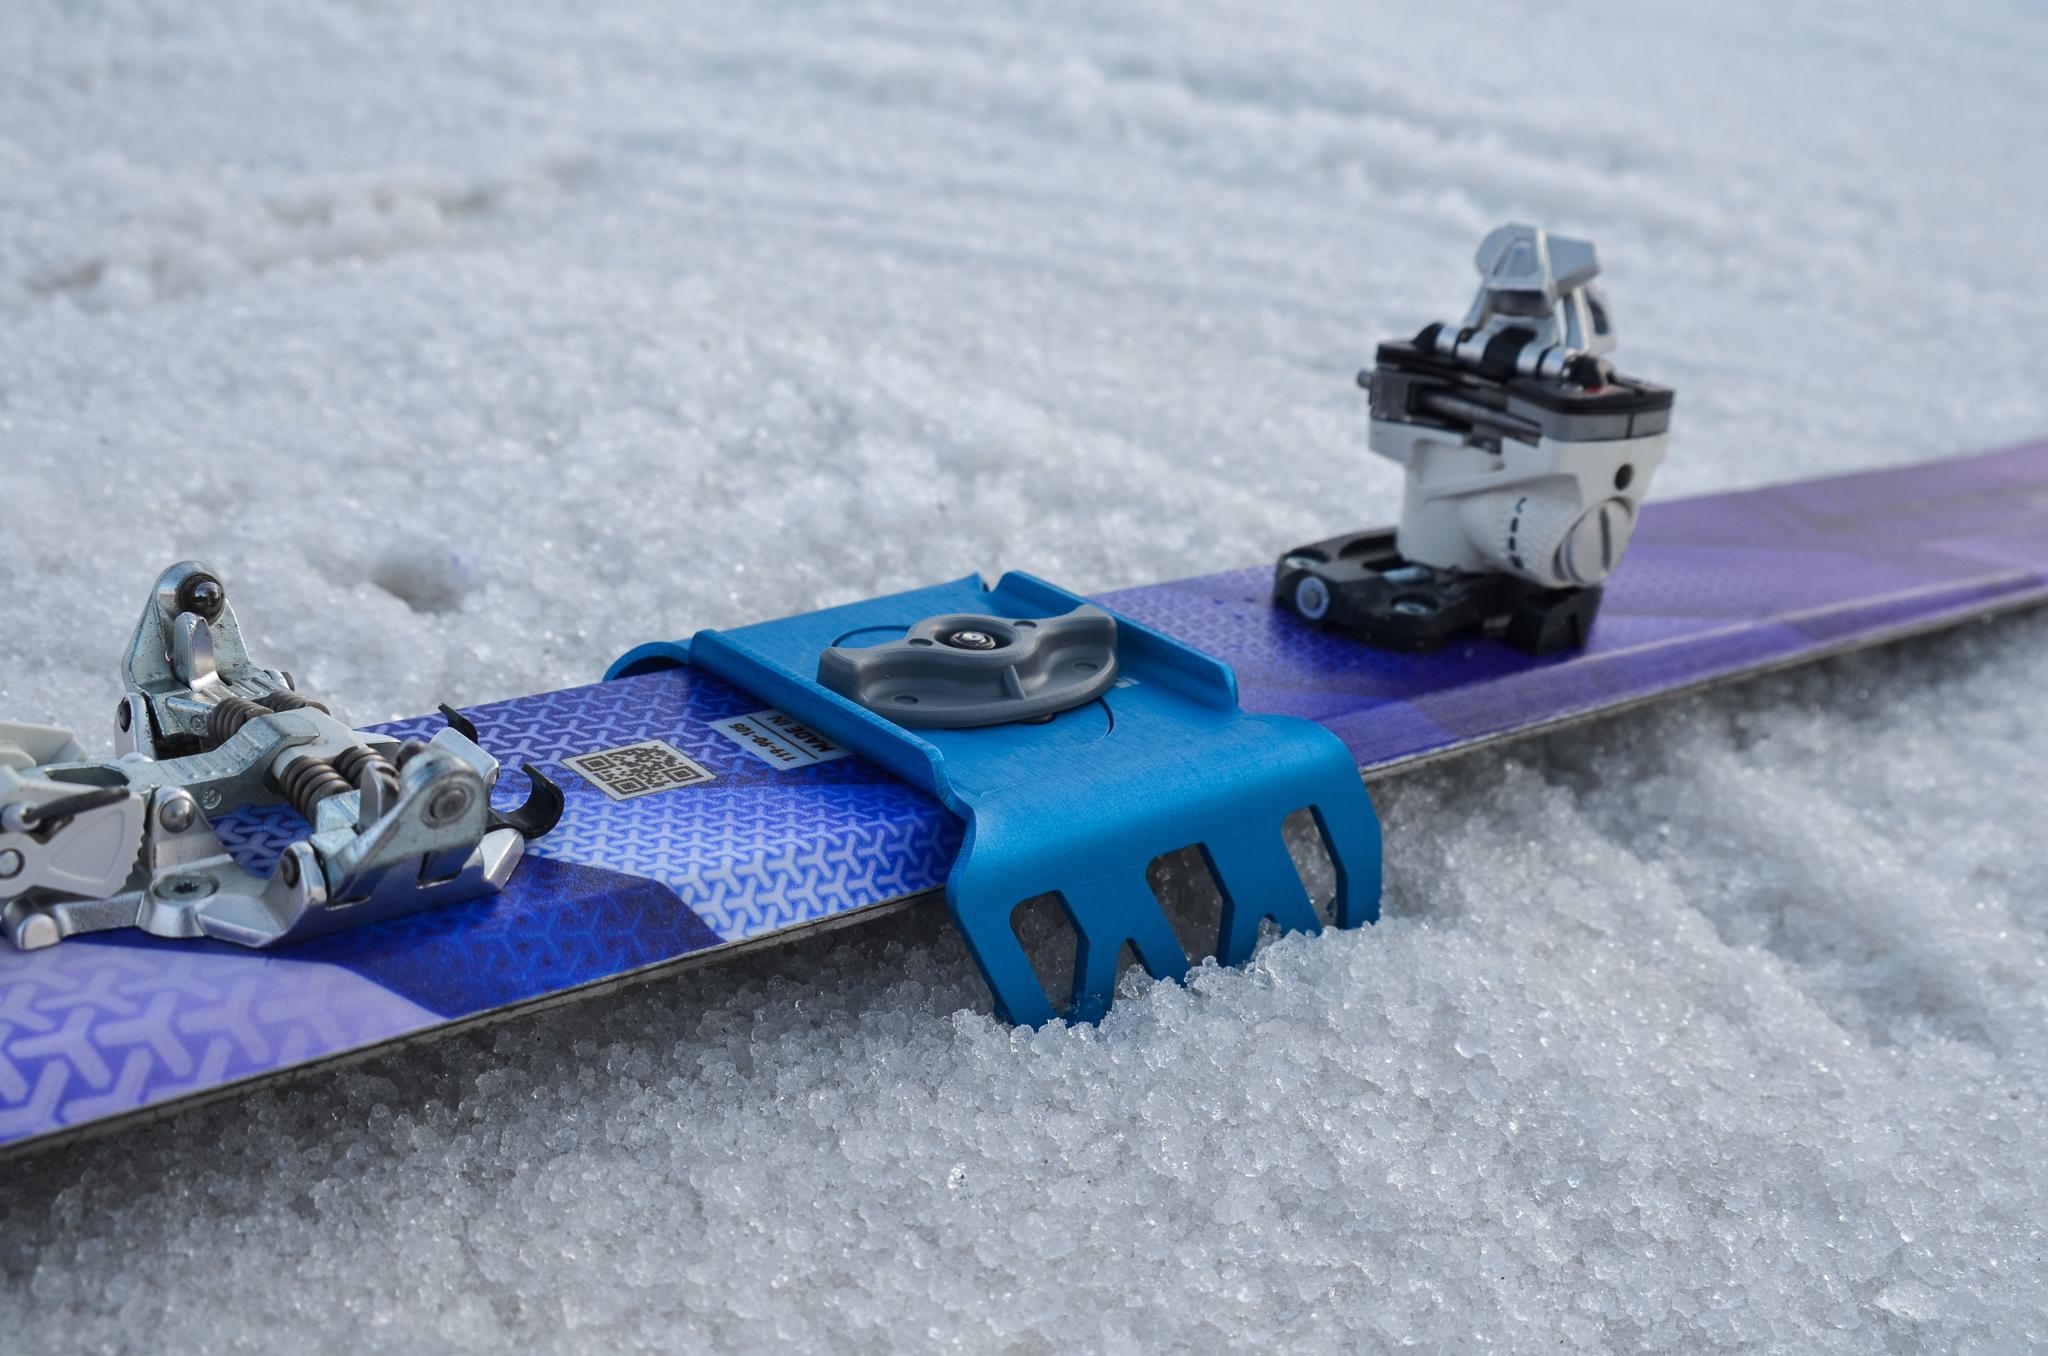 voile_ski_crampons_96mm